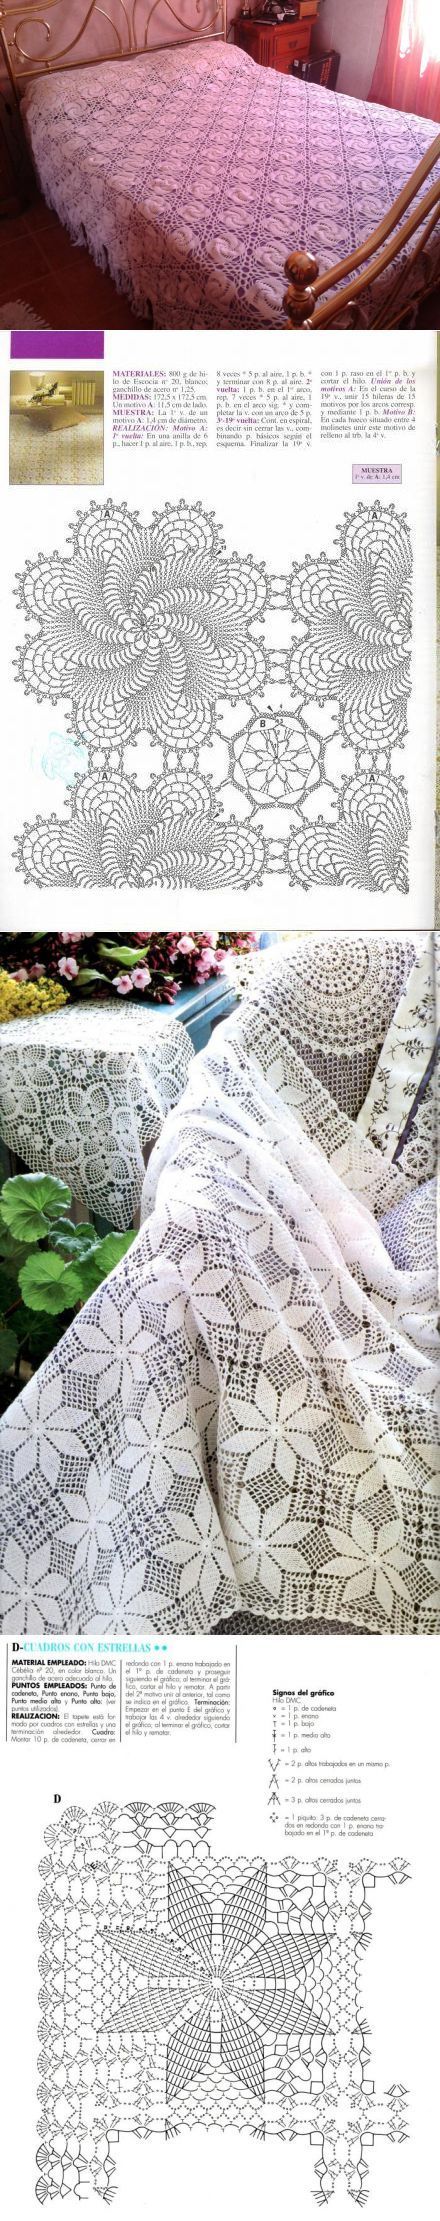 52 best crochet images on Pinterest | Doilies crochet, Crochet ...